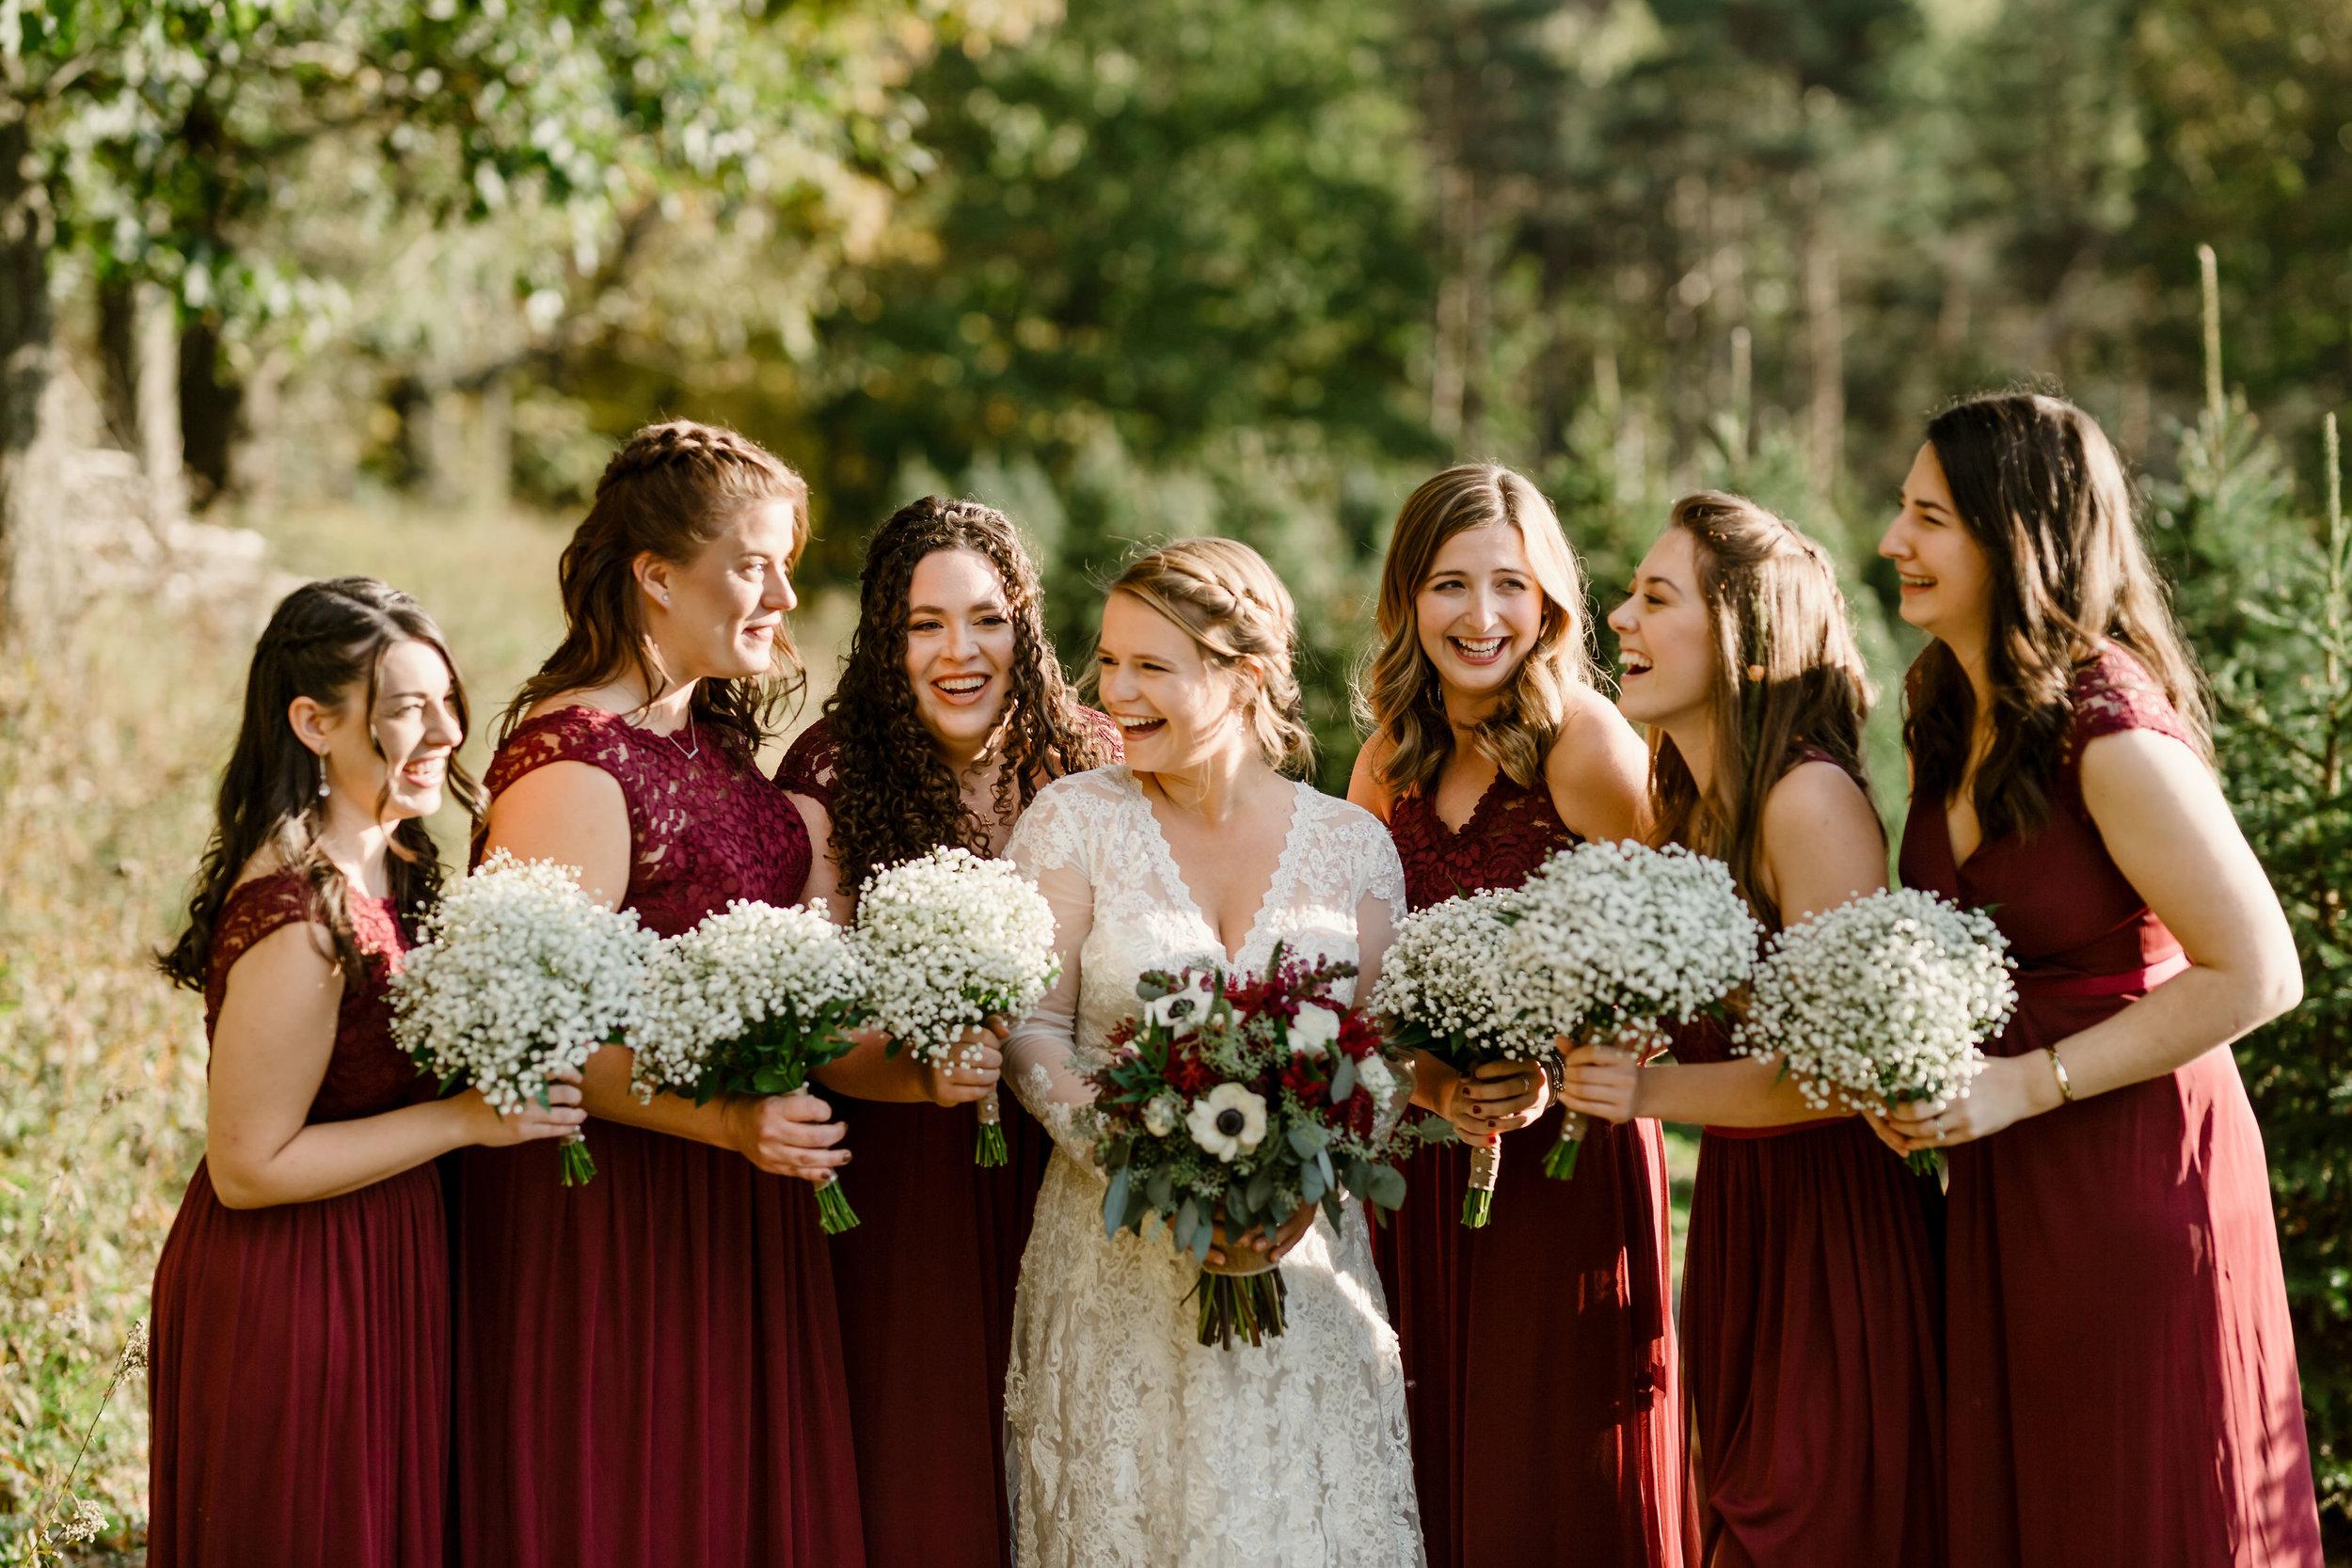 young-love-media-rustic-fall-autumn-wedding-emmerich-tree-farm-hudson-valley-warwick-new-york-ceremony-53.jpg